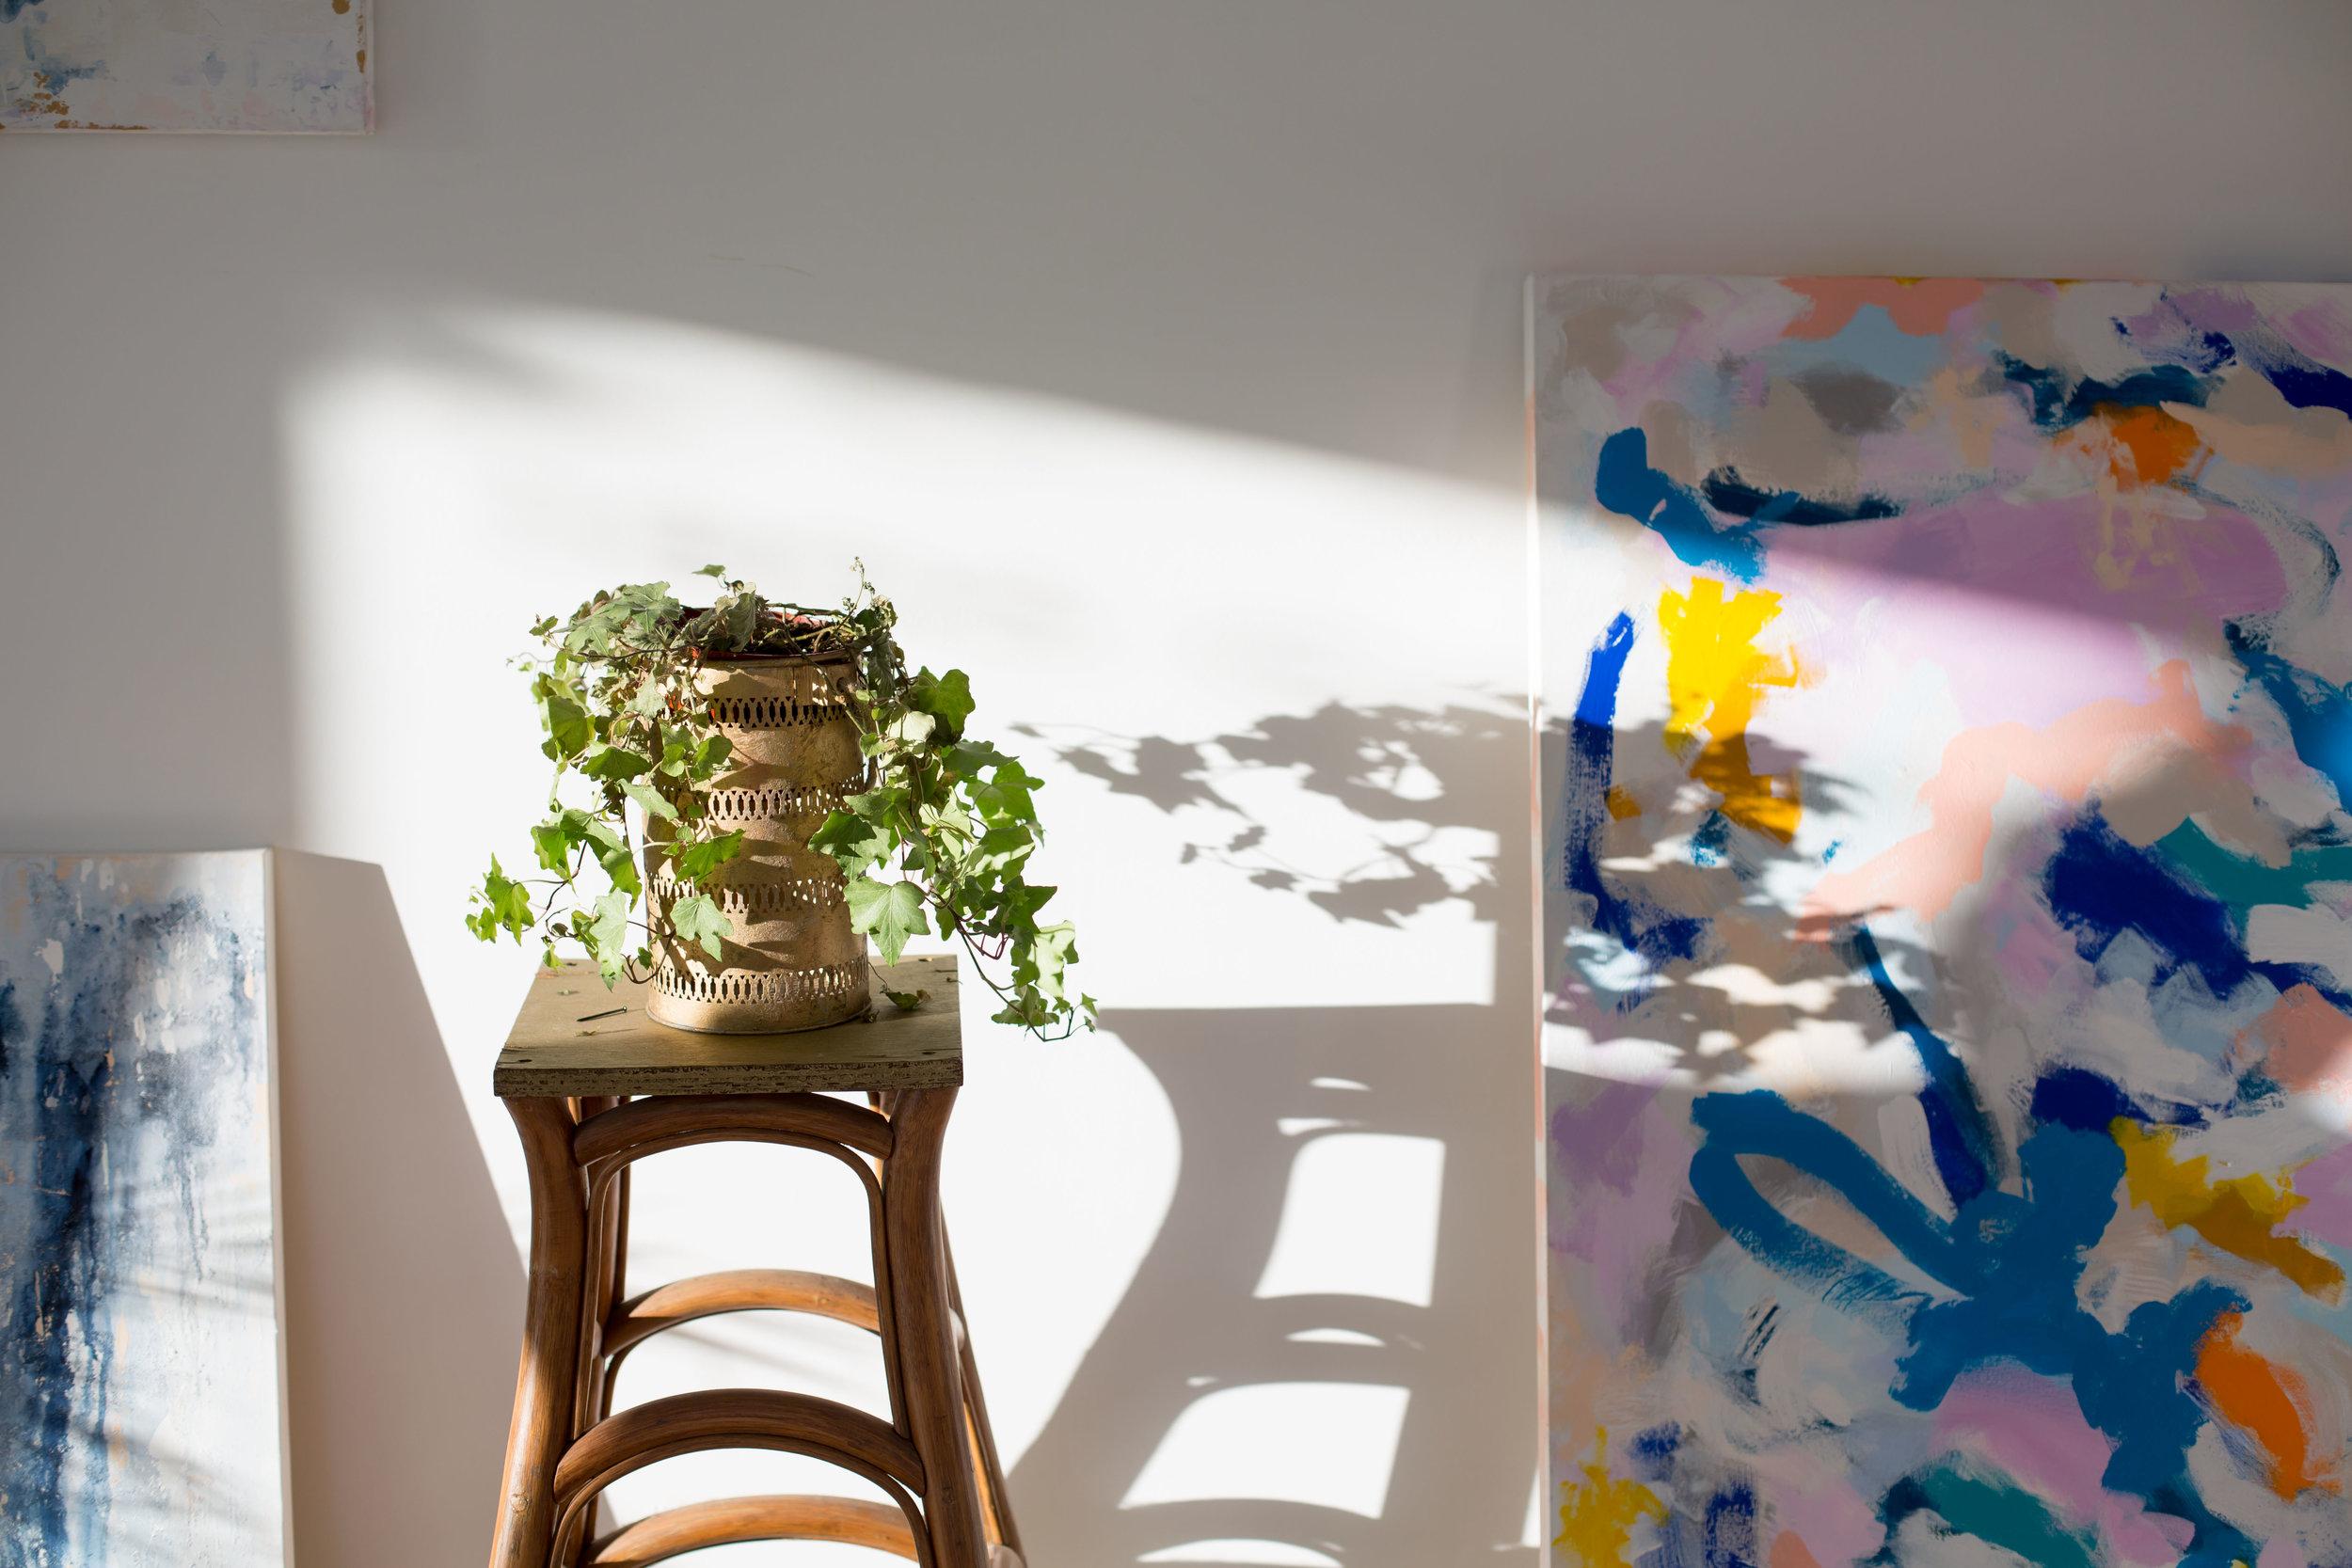 san-diego-photographer-branding-studio-create-with-gusto-artist-samantha-louise-marett-22.jpg